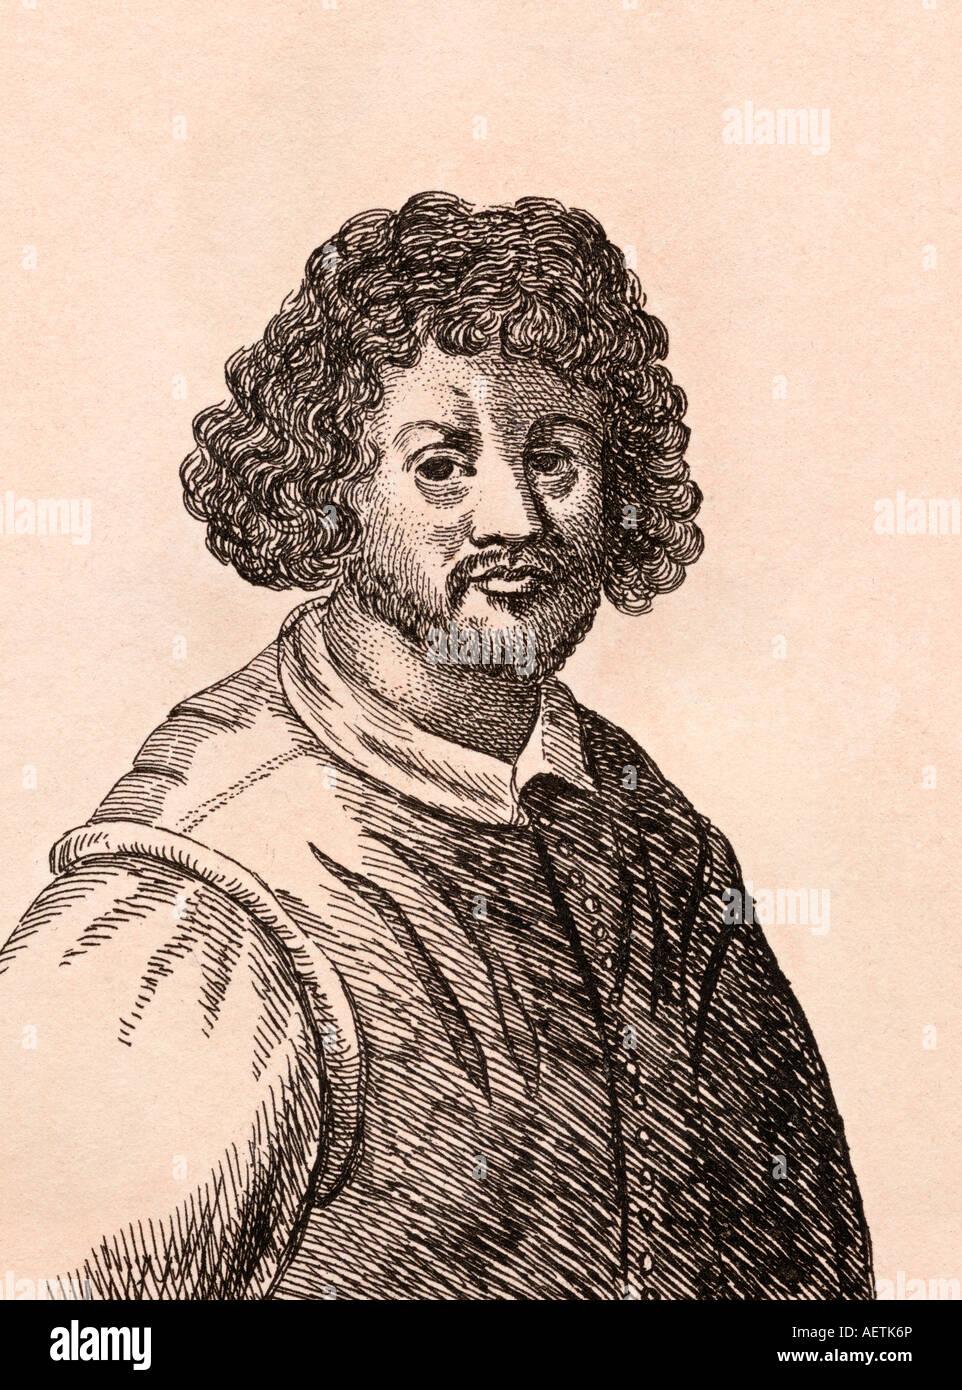 Claude Lorrain aka Claude Gellée aka Le Lorrain 1600 1682 French Baroque era artist - Stock Image